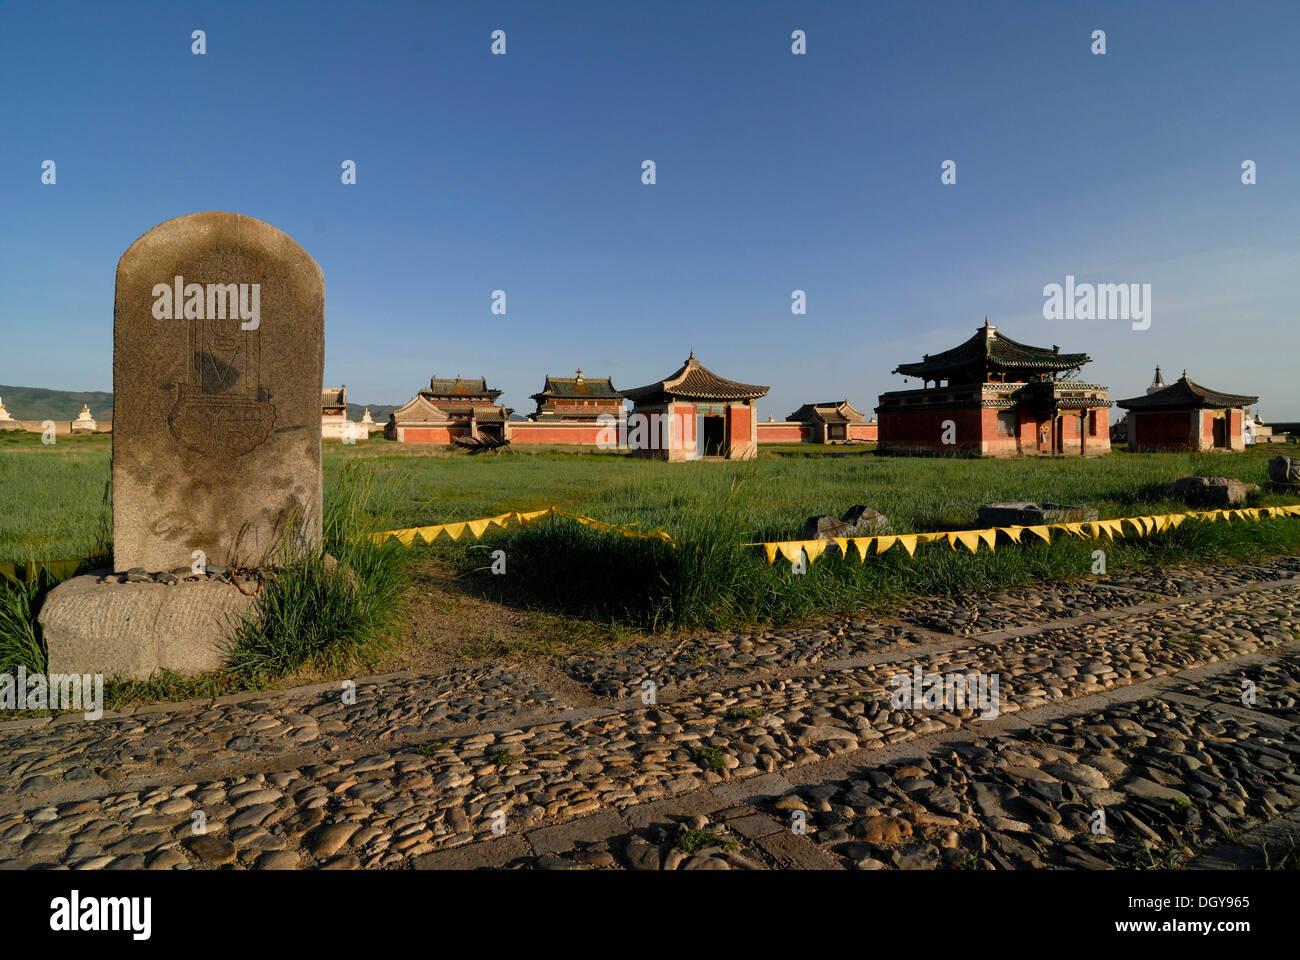 Temples and stone slabs at Erdene Zuu Khiid Monastery, Karakorum, Kharkhorin, Oevoerkhangai Aimak, Mongolia, Asia - Stock Image